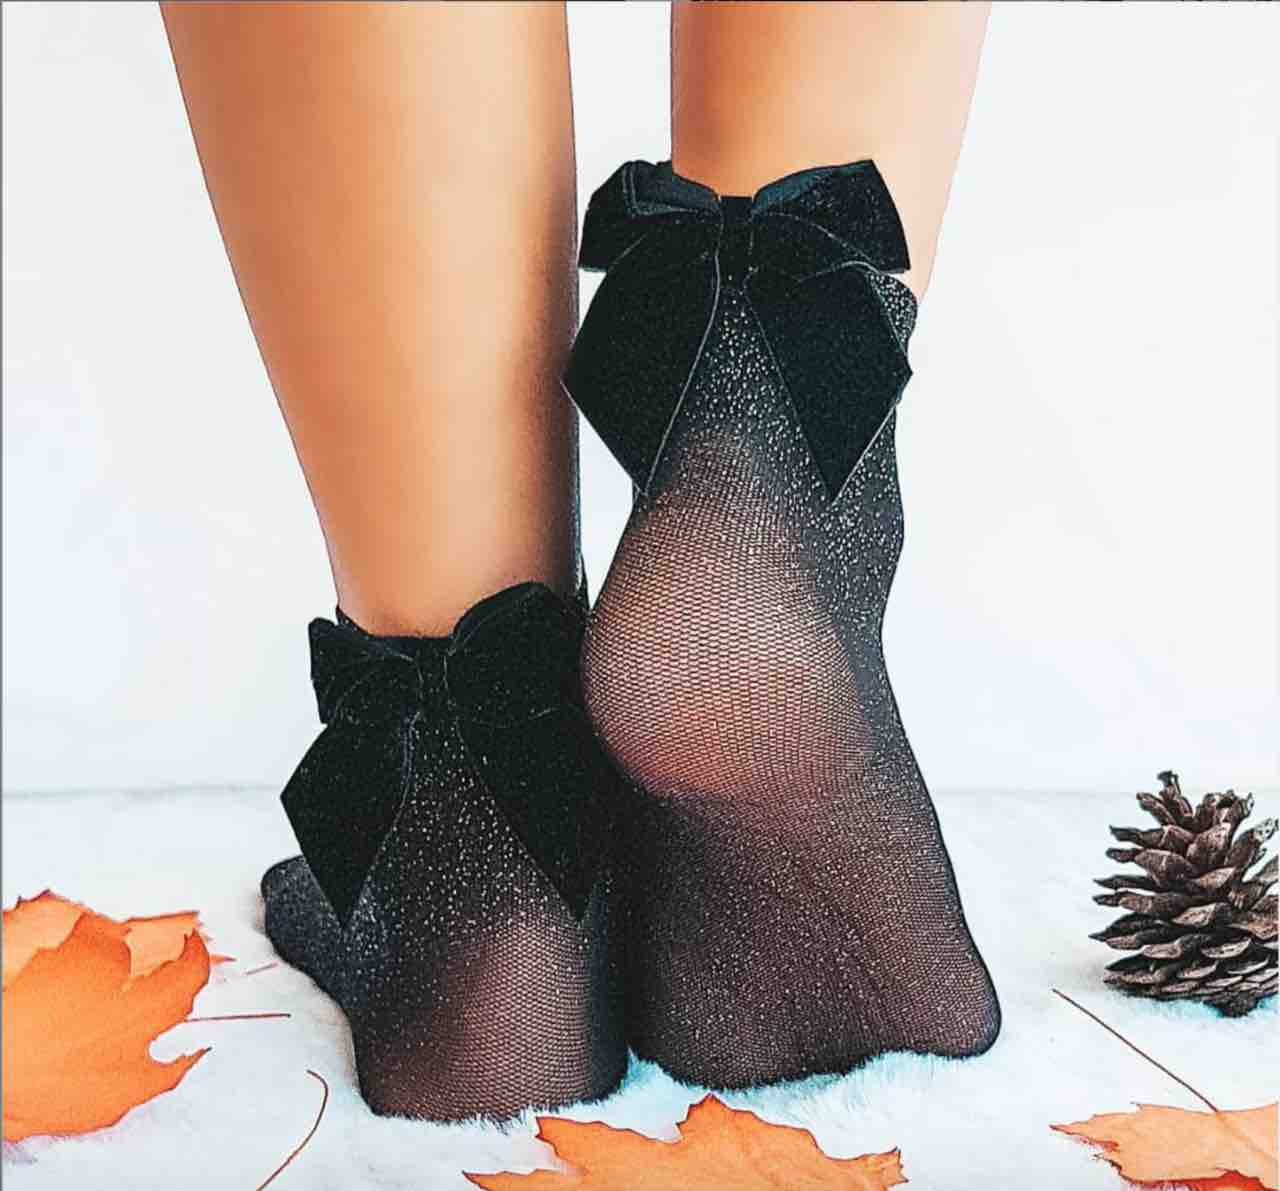 calzini originali